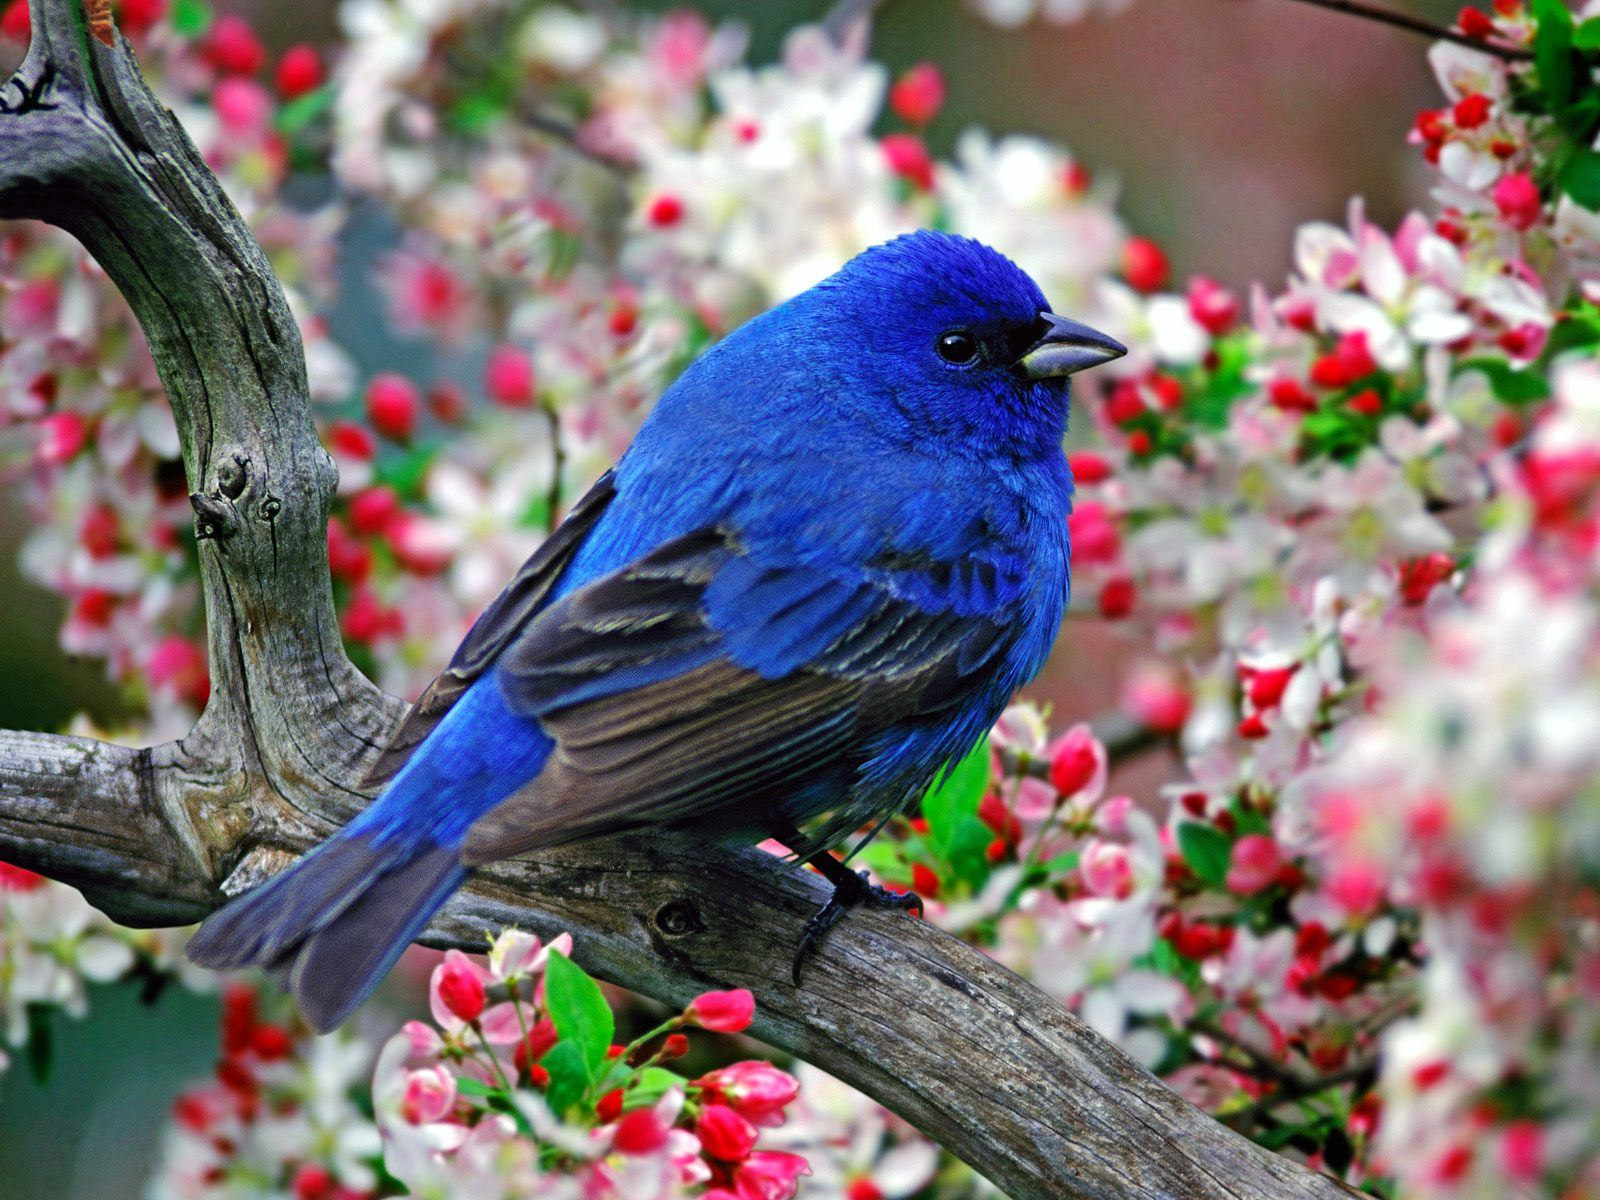 https://3rdeyevisionblog.files.wordpress.com/2013/02/blue-bird.jpg ...